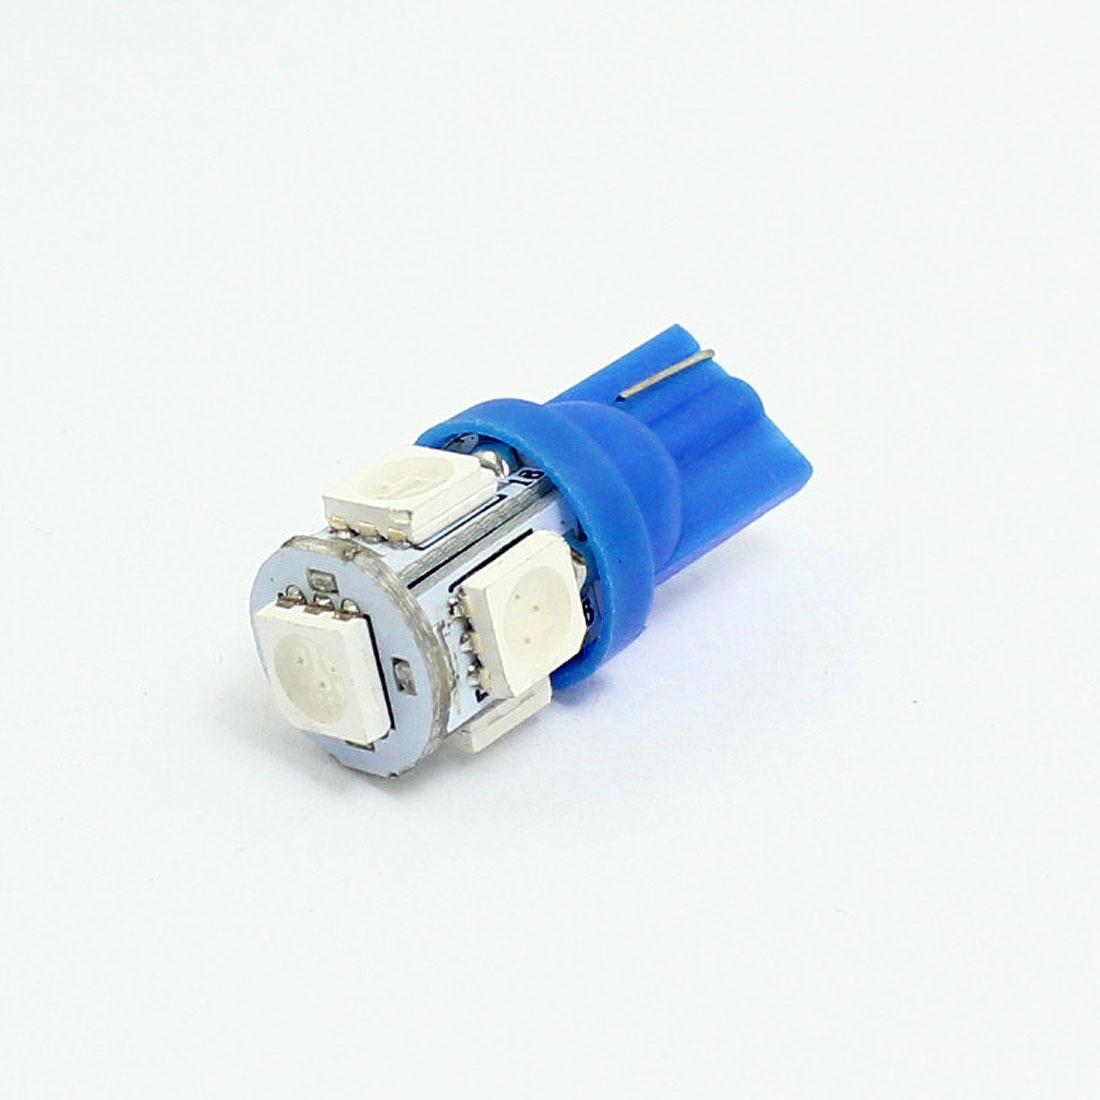 T10 904 Blue 5 LED 5050 SMD Lamp License Plate Meter Panel Light for Car